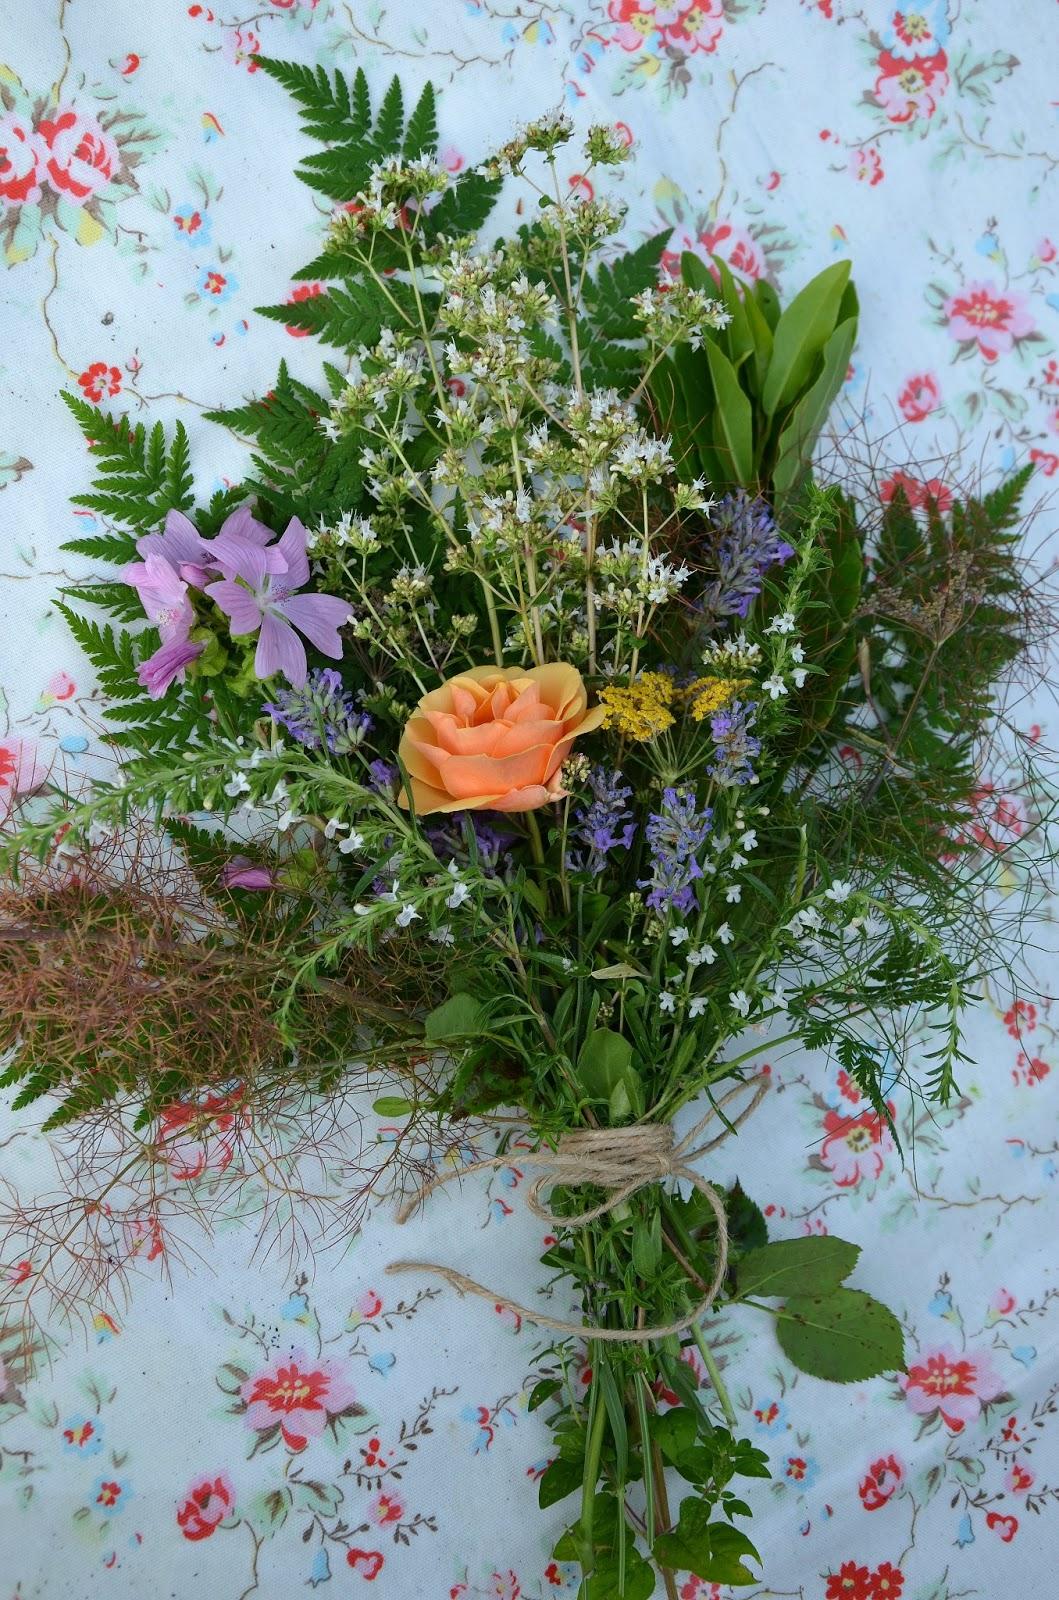 Chrissie Crafts: The edible bouquet